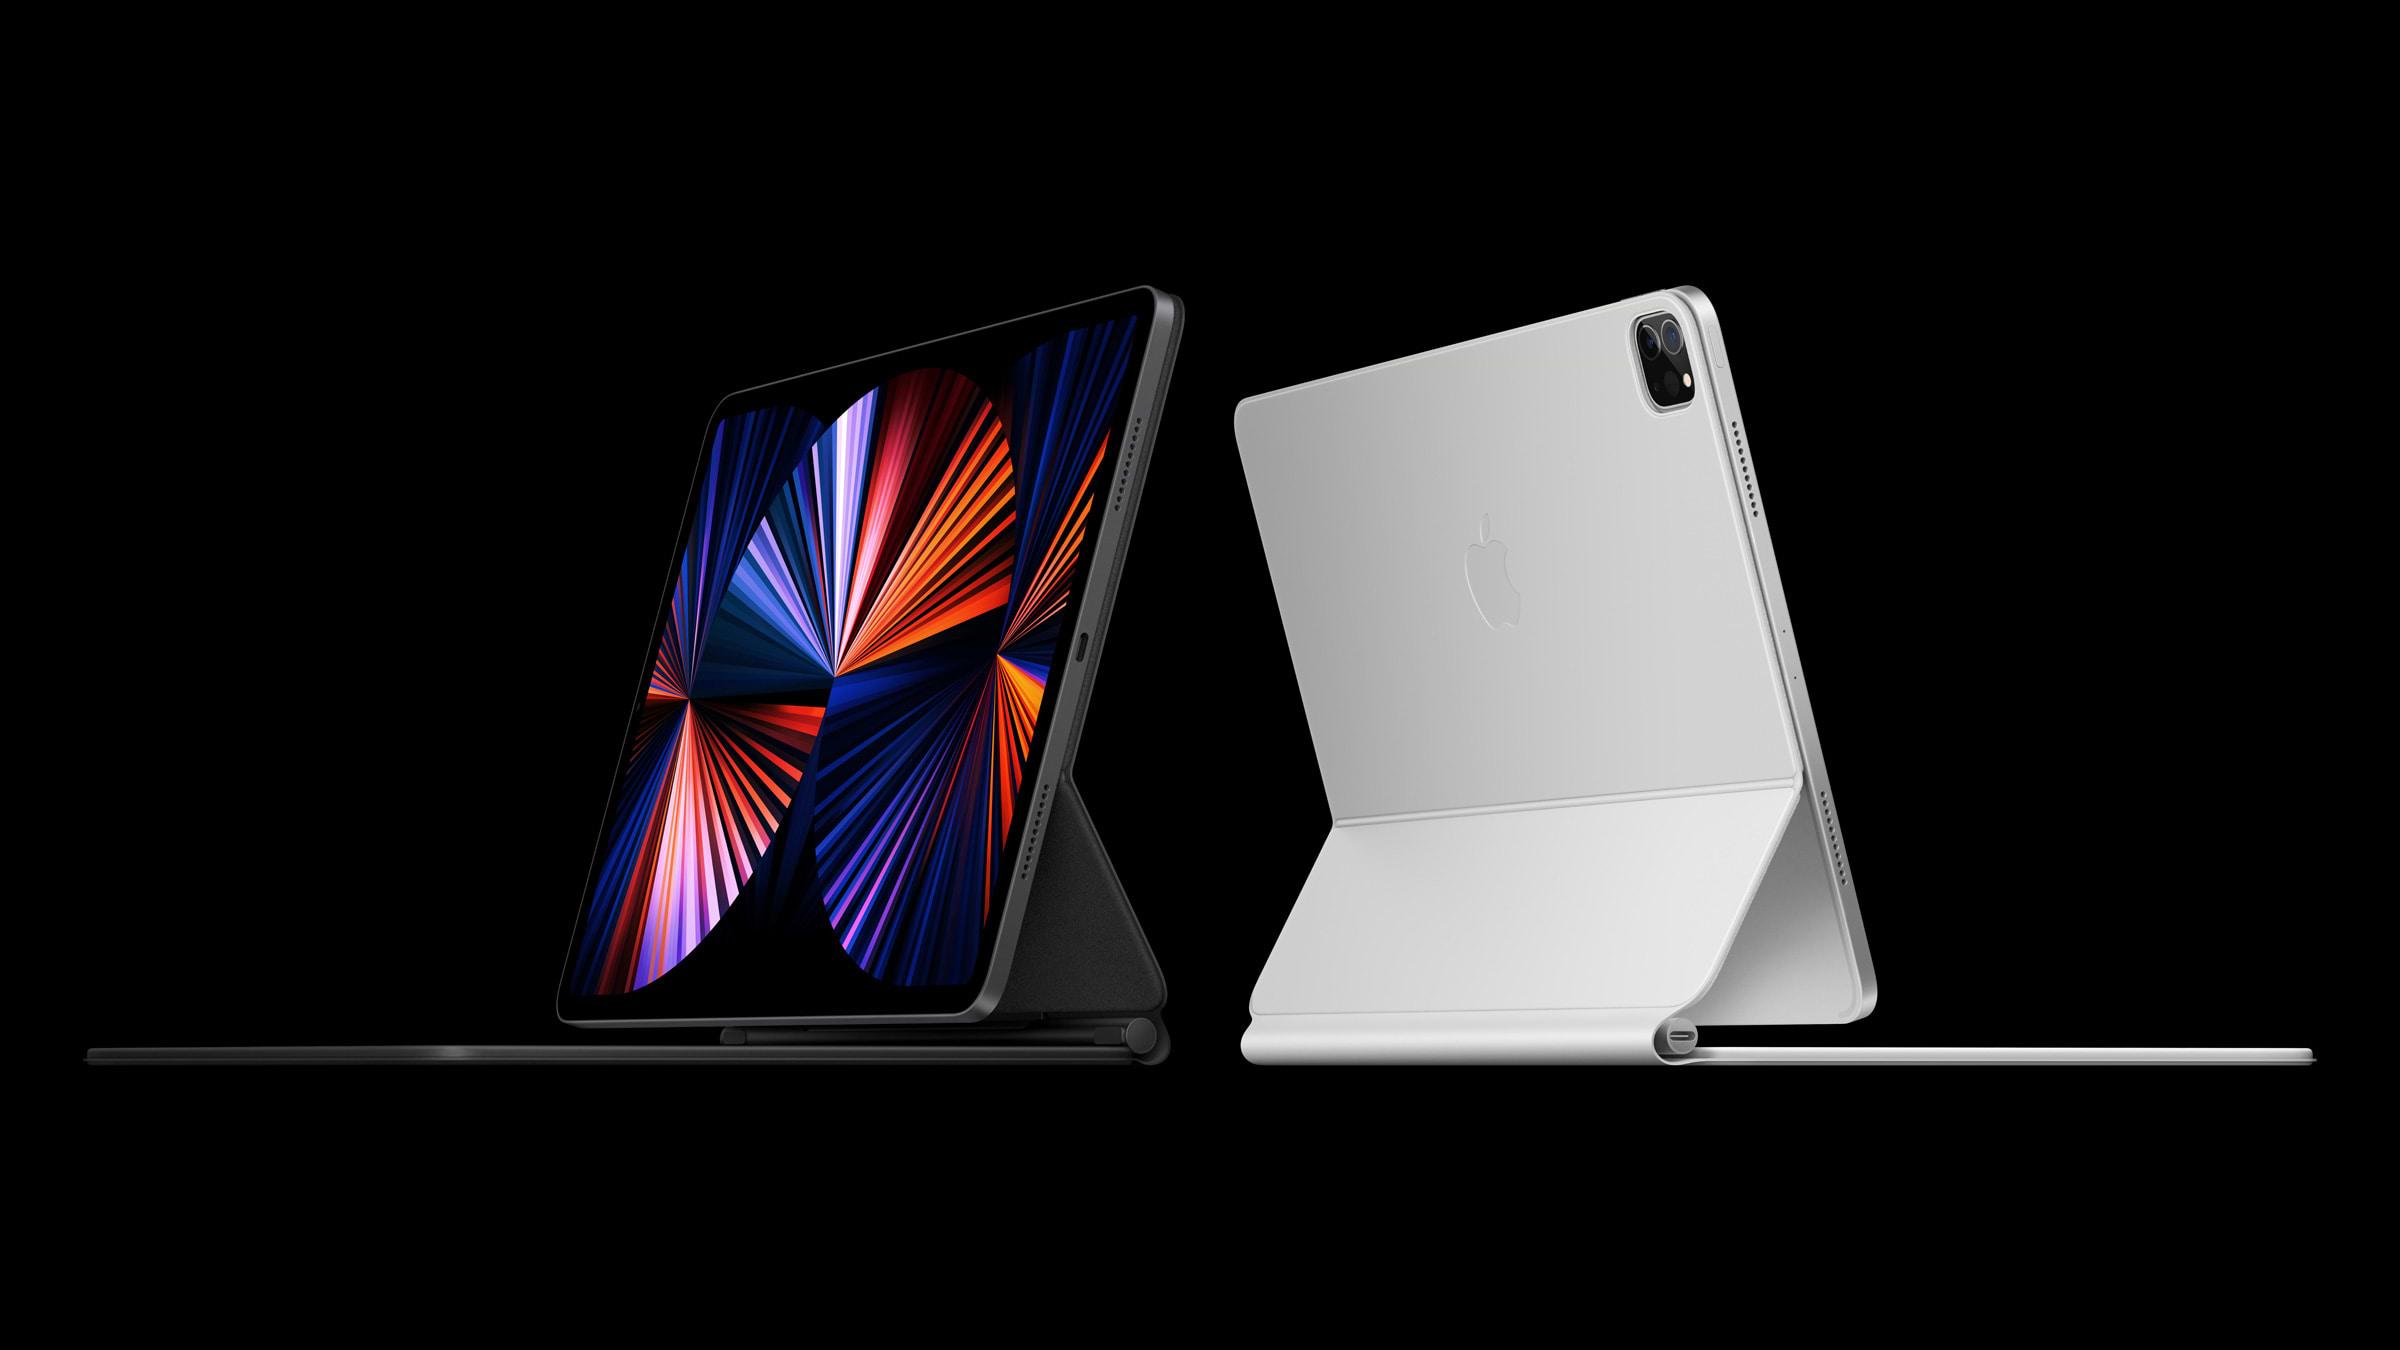 Apple חושפת את ה- iPad Pro החדש עם שבב ה- M1 ותצוגת Liquid Retina XDR מדהימה